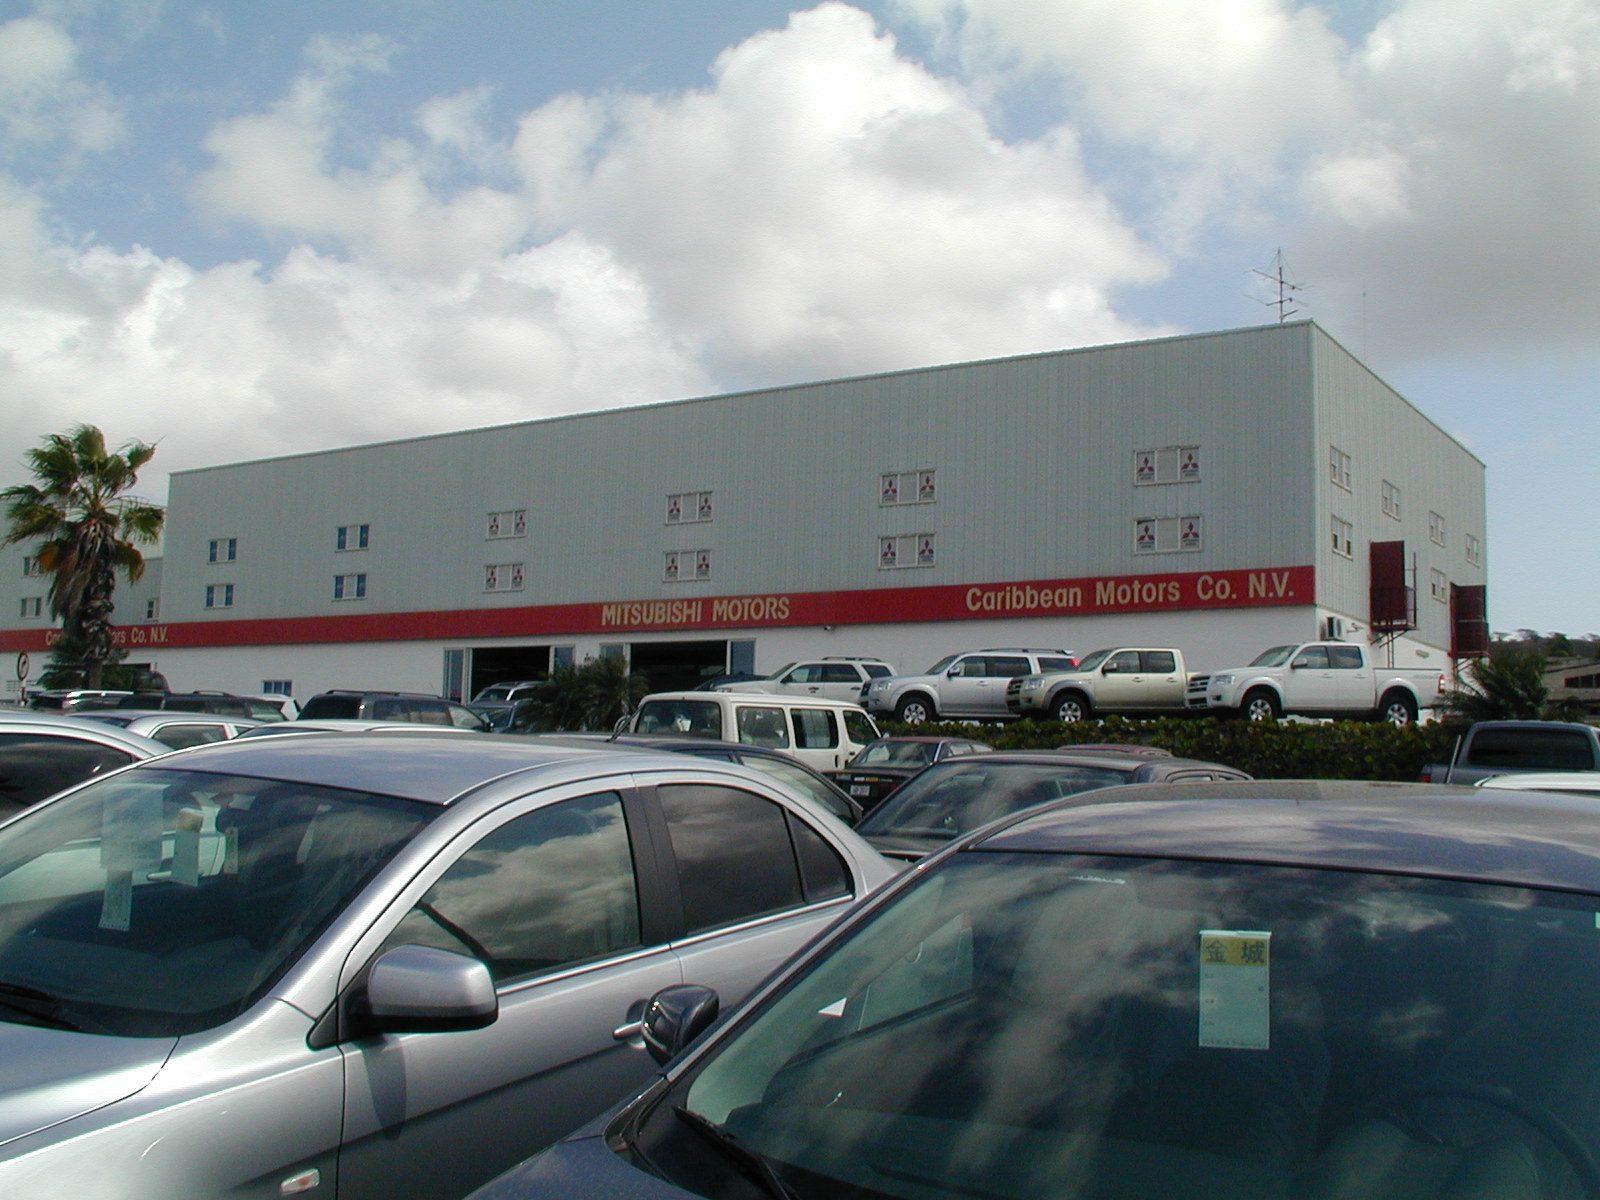 Caribbean Motors is using Free Software